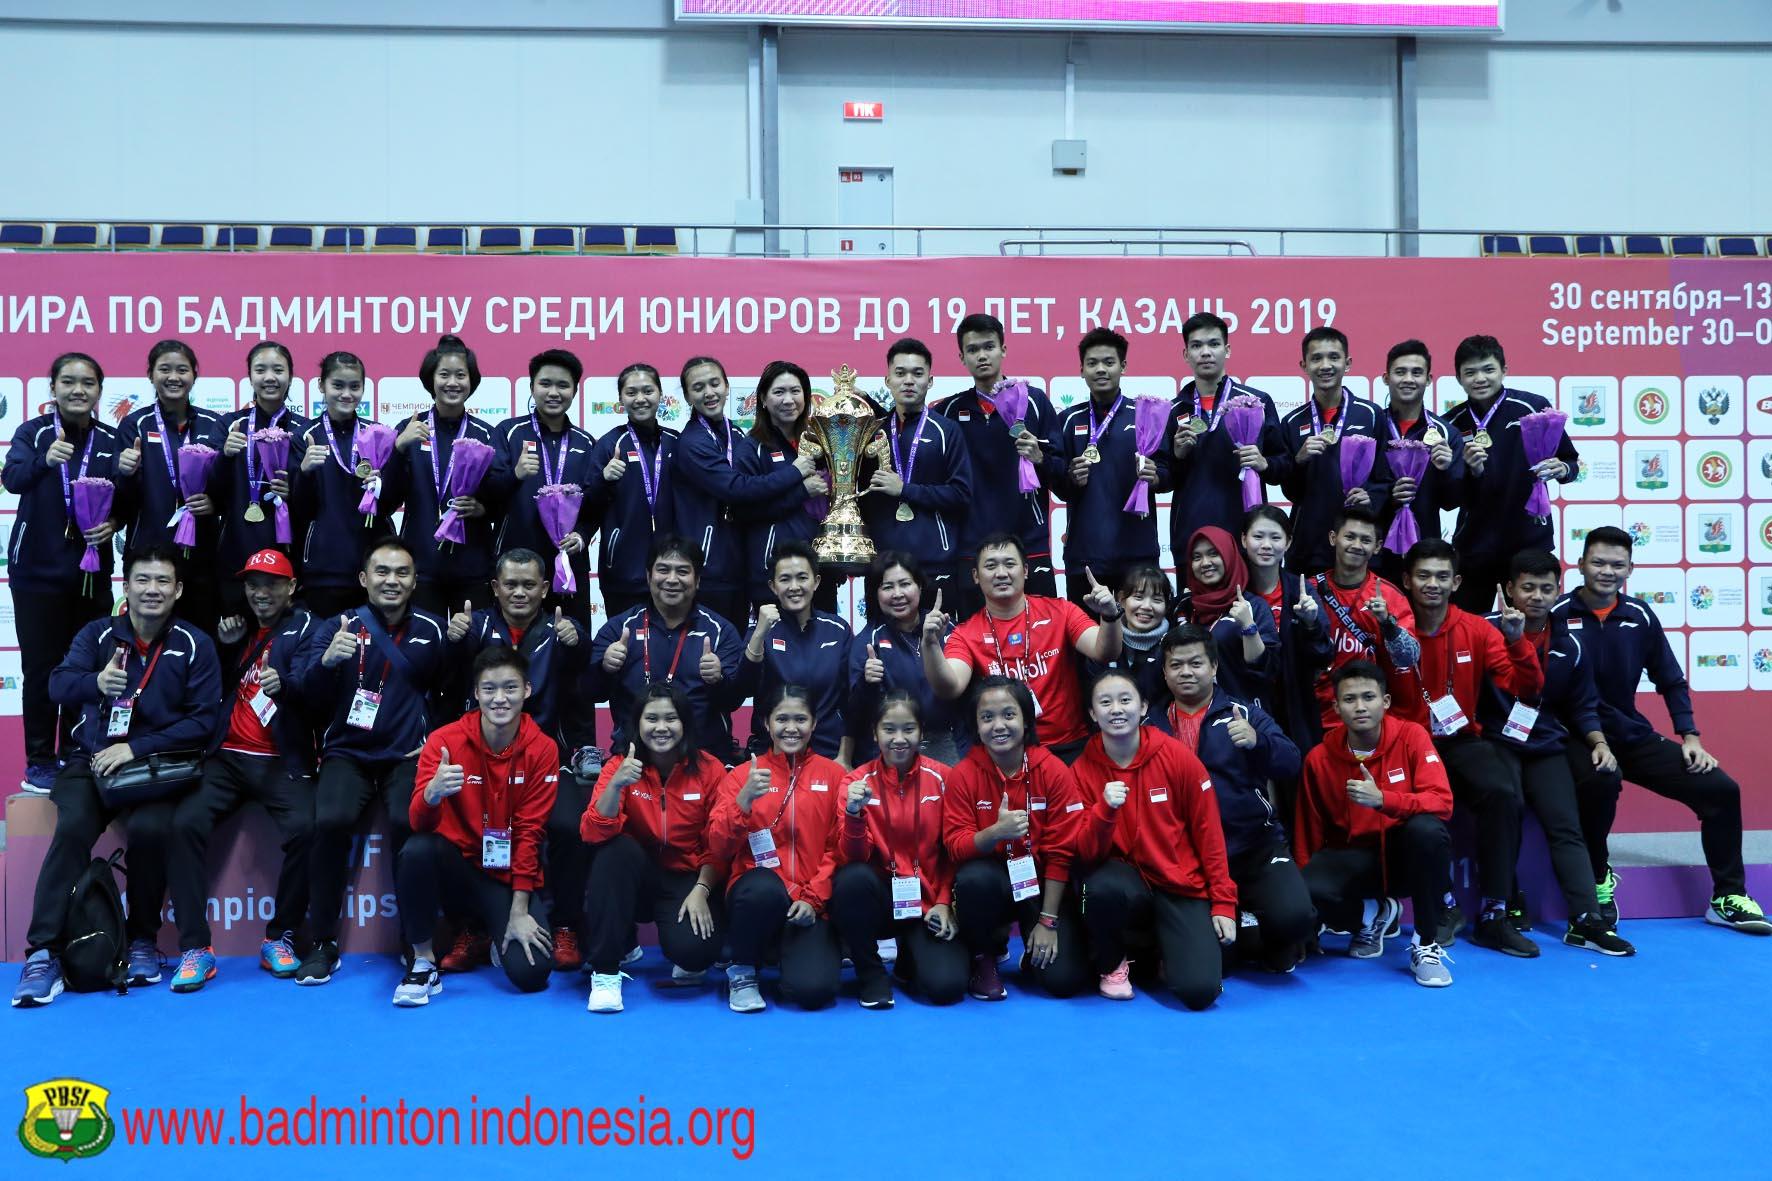 https: img.okeinfo.net content 2019 10 18 40 2118795 bersinar-di-kejuaraan-bulu-tangkis-junior-2019-indonesia-terima-penghargaan-iGfU8tQmZ9.jpg